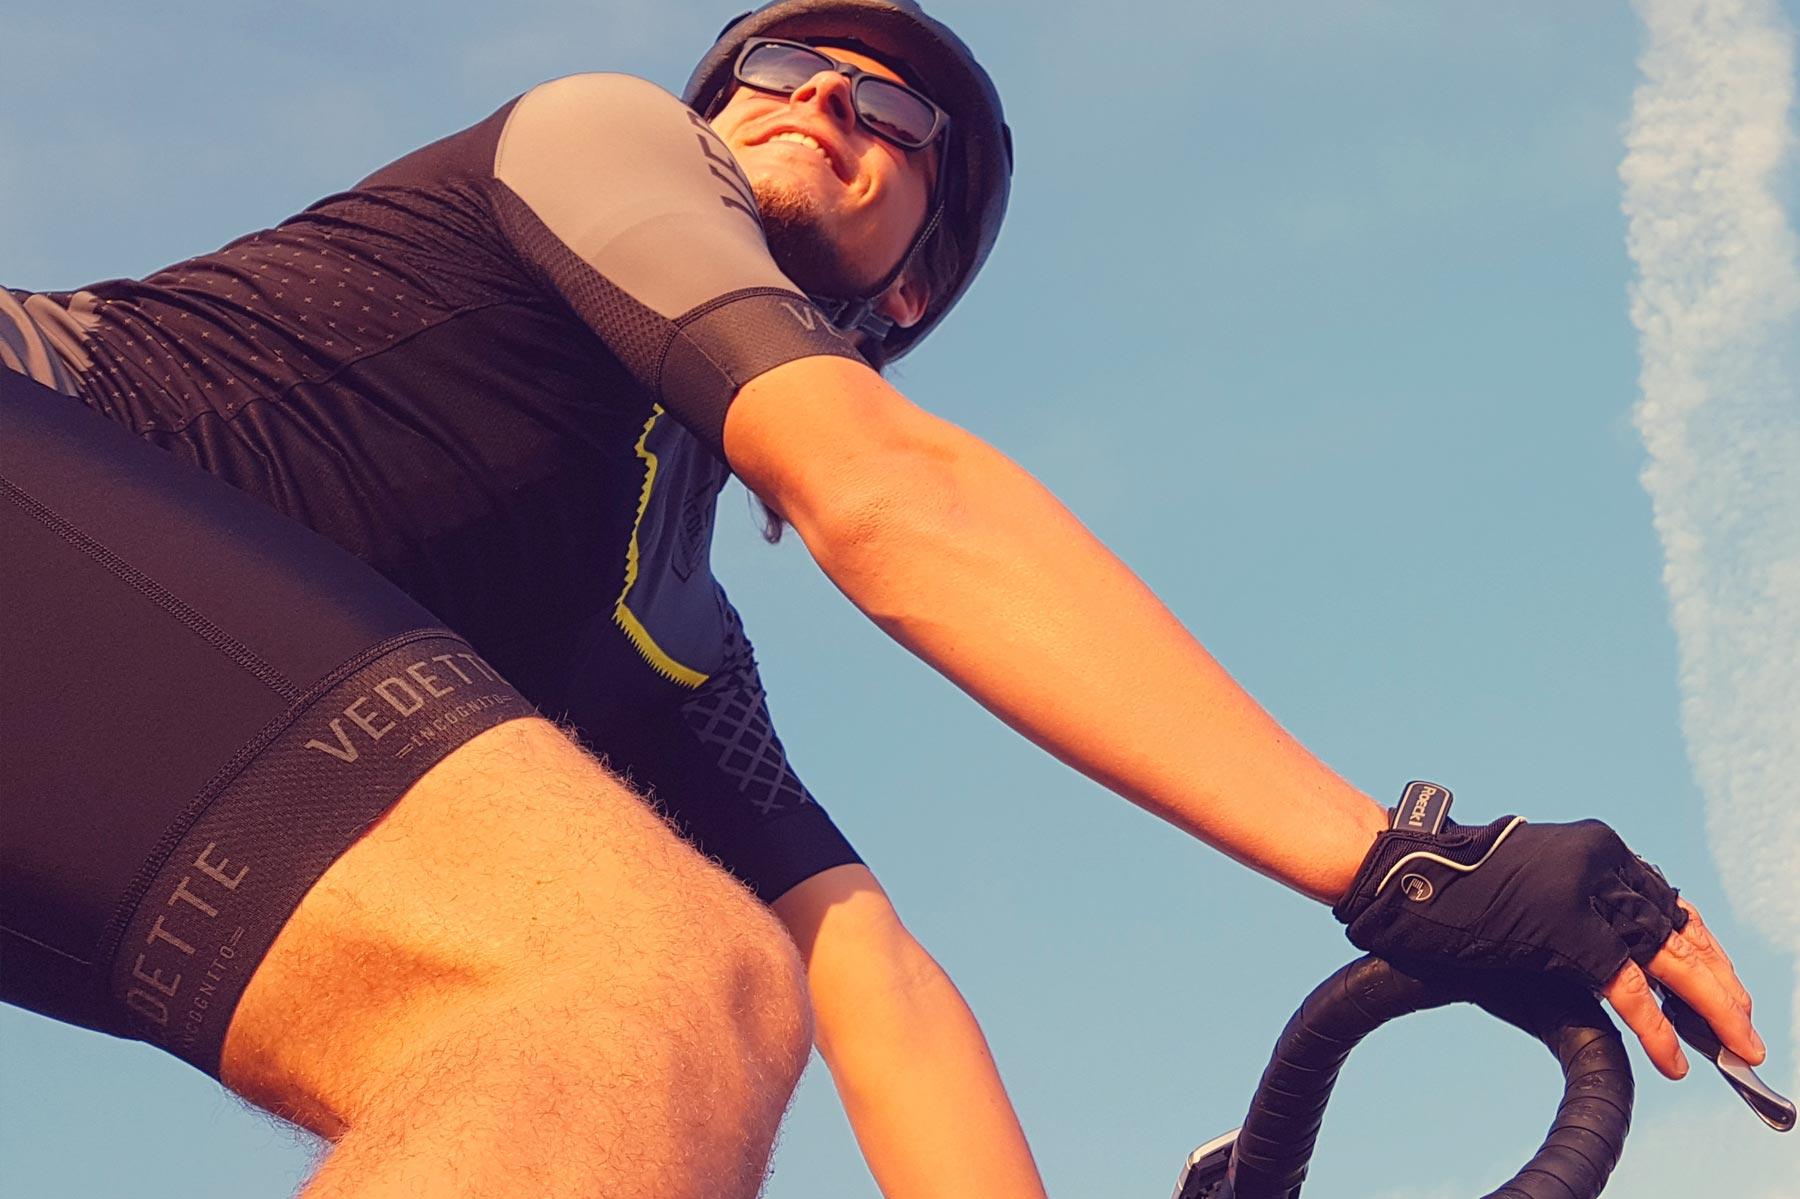 vedette-incognito heren fietskleding